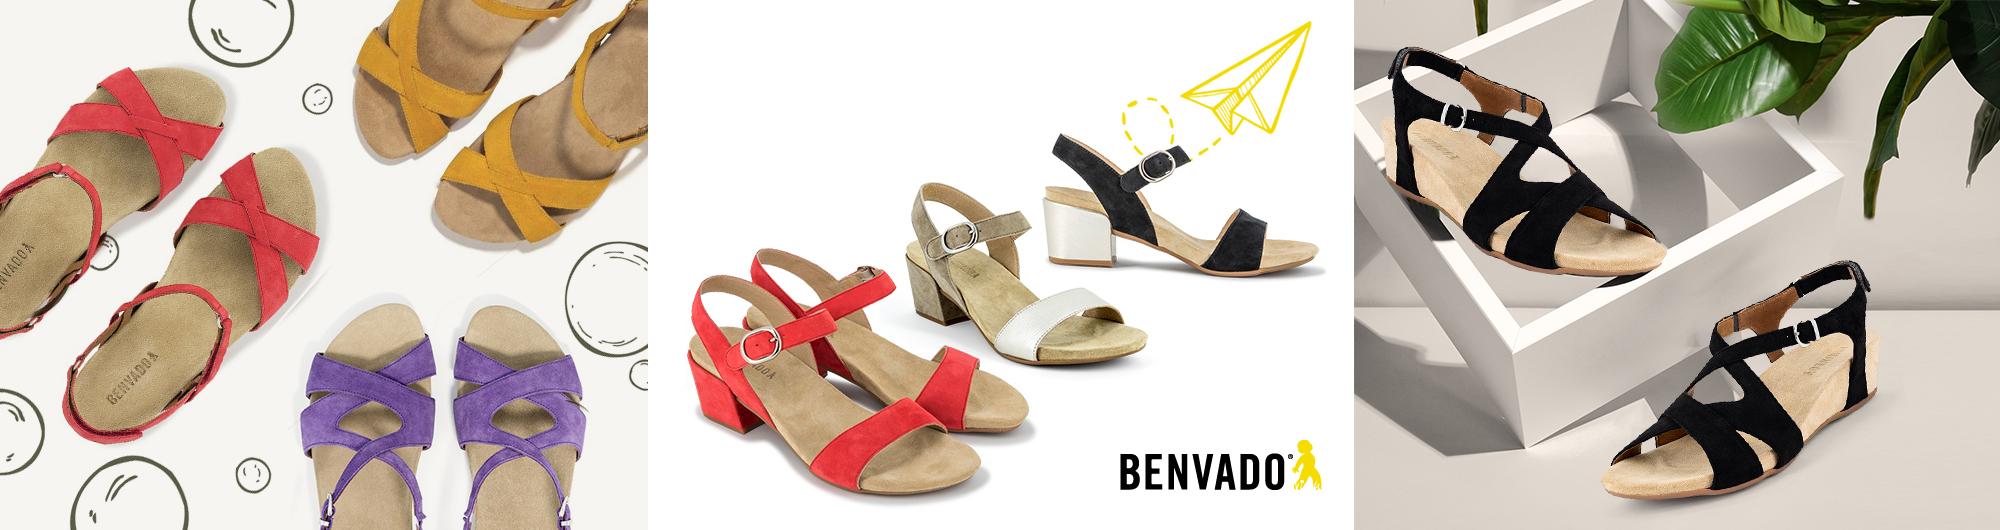 Дамски сандали Бенвадо - ортопедични сандали